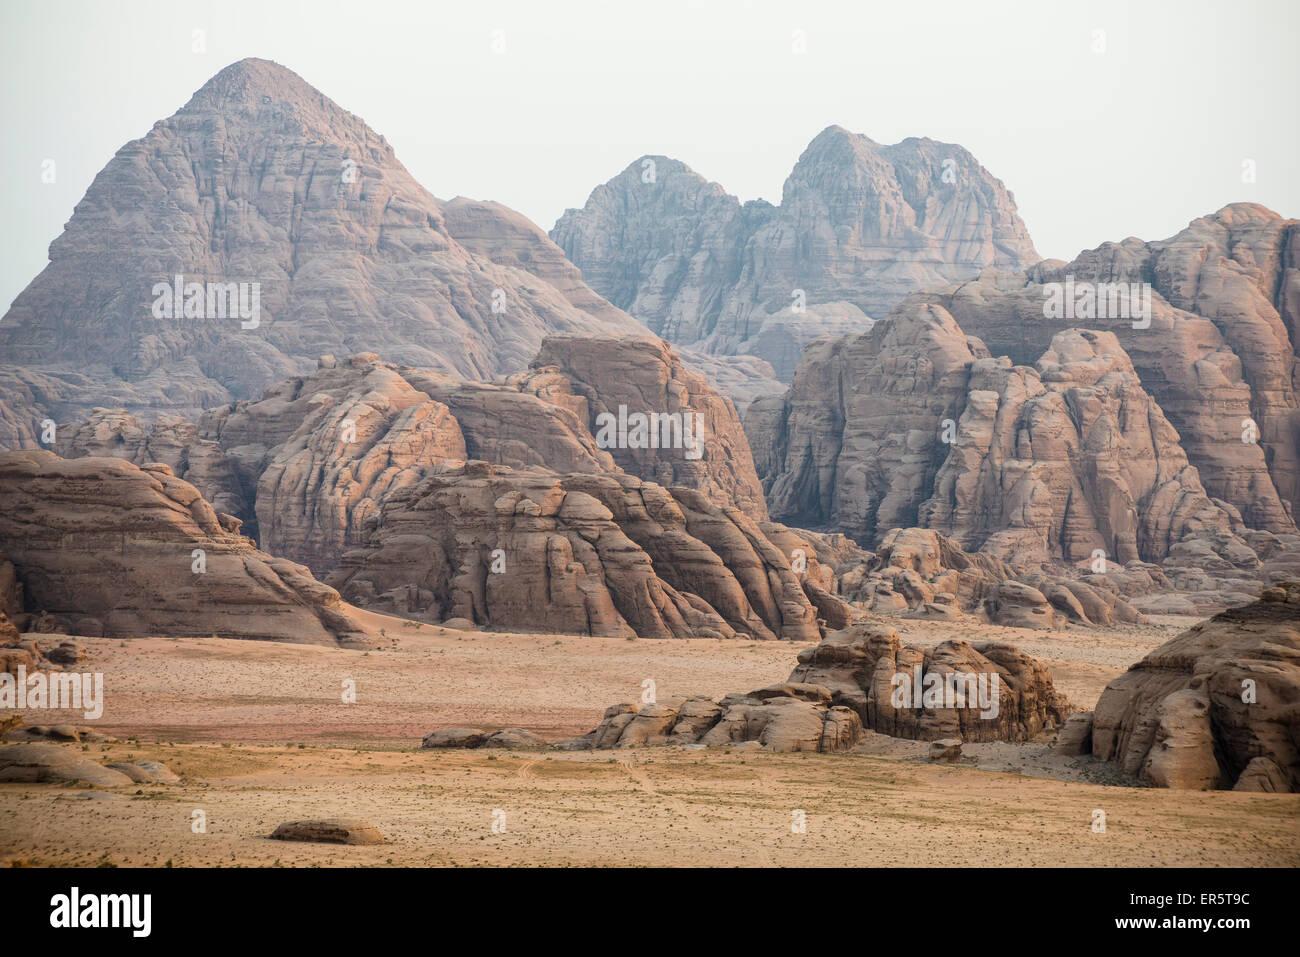 Rock Fromations, Wadi Rum, Jordanien, Naher Osten Stockbild